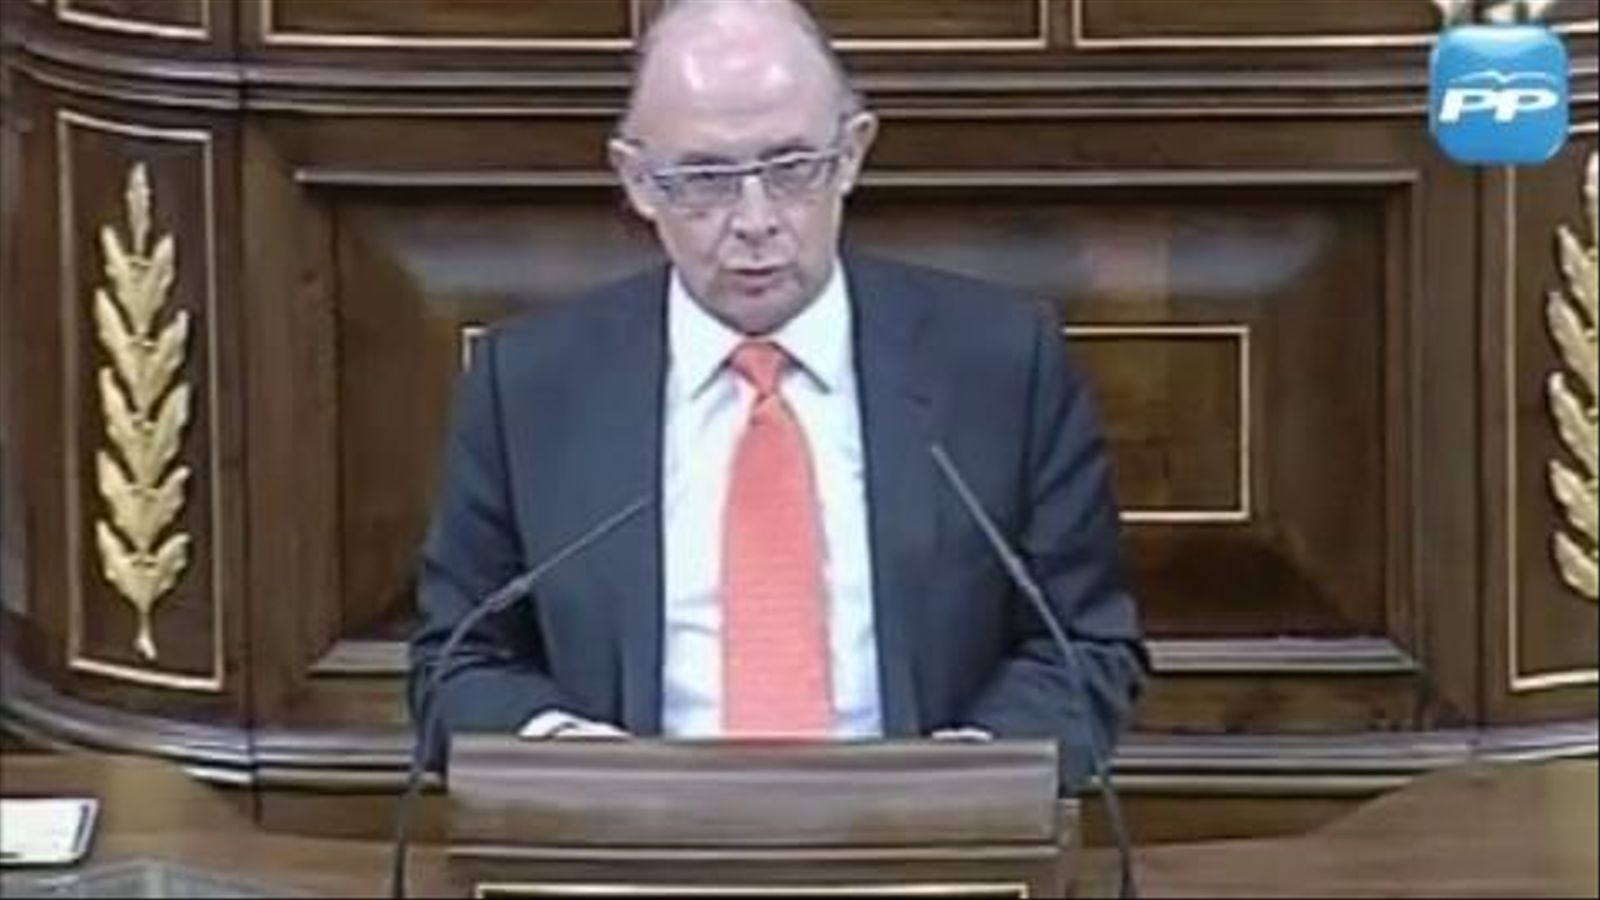 Montoro va liderar la campanya del PP contra la pujada de l'IVA de Zapatero